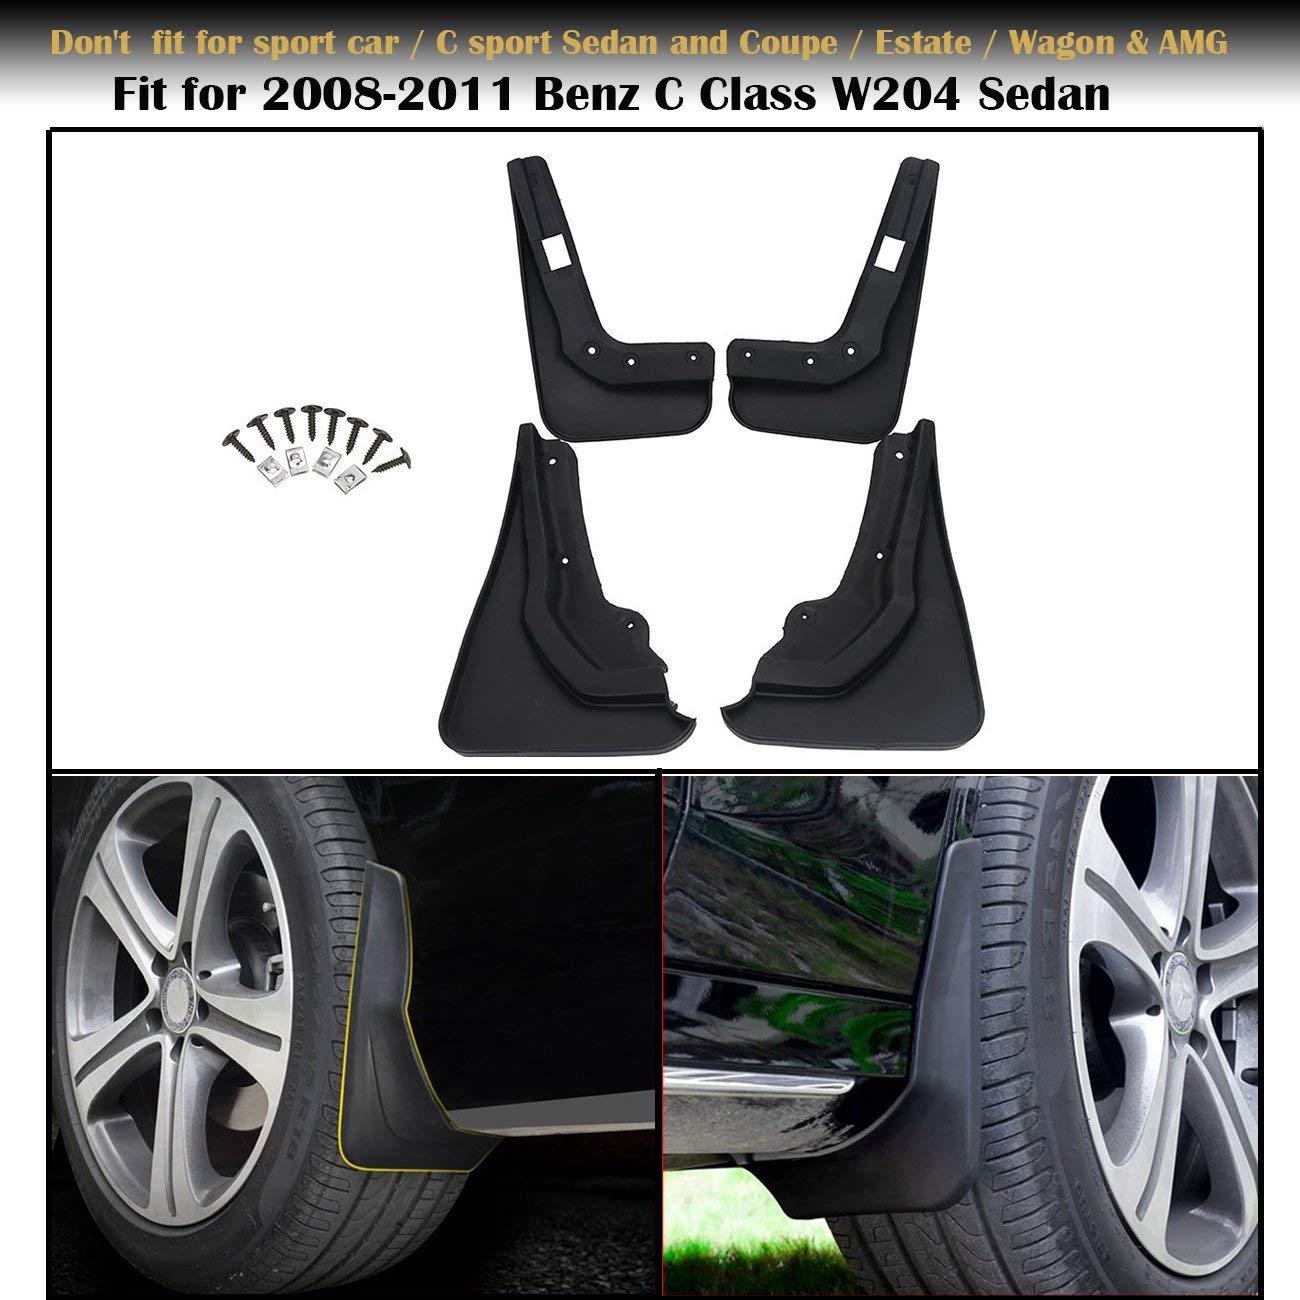 Mudflaps Splash Guards 4pcs Auto Accessories Fit For Mercedes Benz C-class W204 Mud Flap Fenders Splash Guards Mudguards Car Styling In 2011-2014 Front Rear Splash Mud